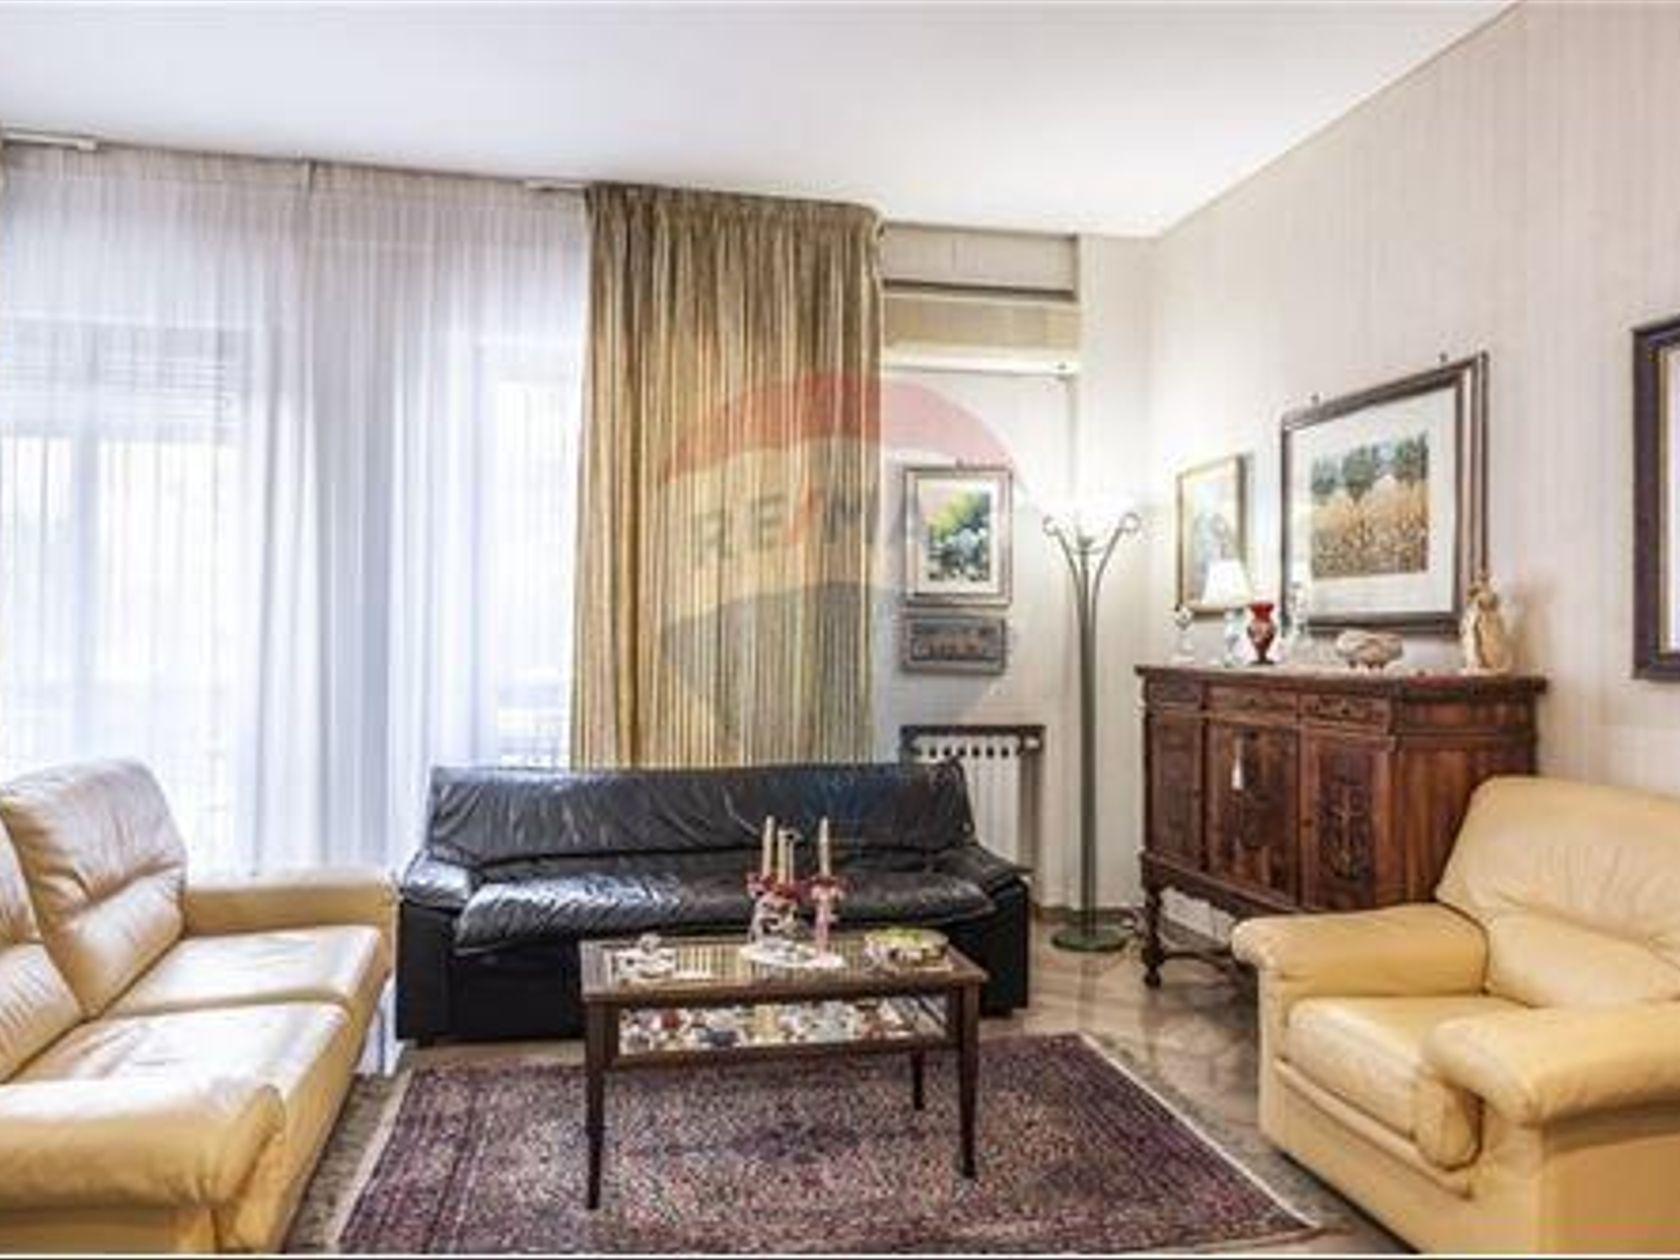 Appartamento Japigia, Bari, BA Vendita